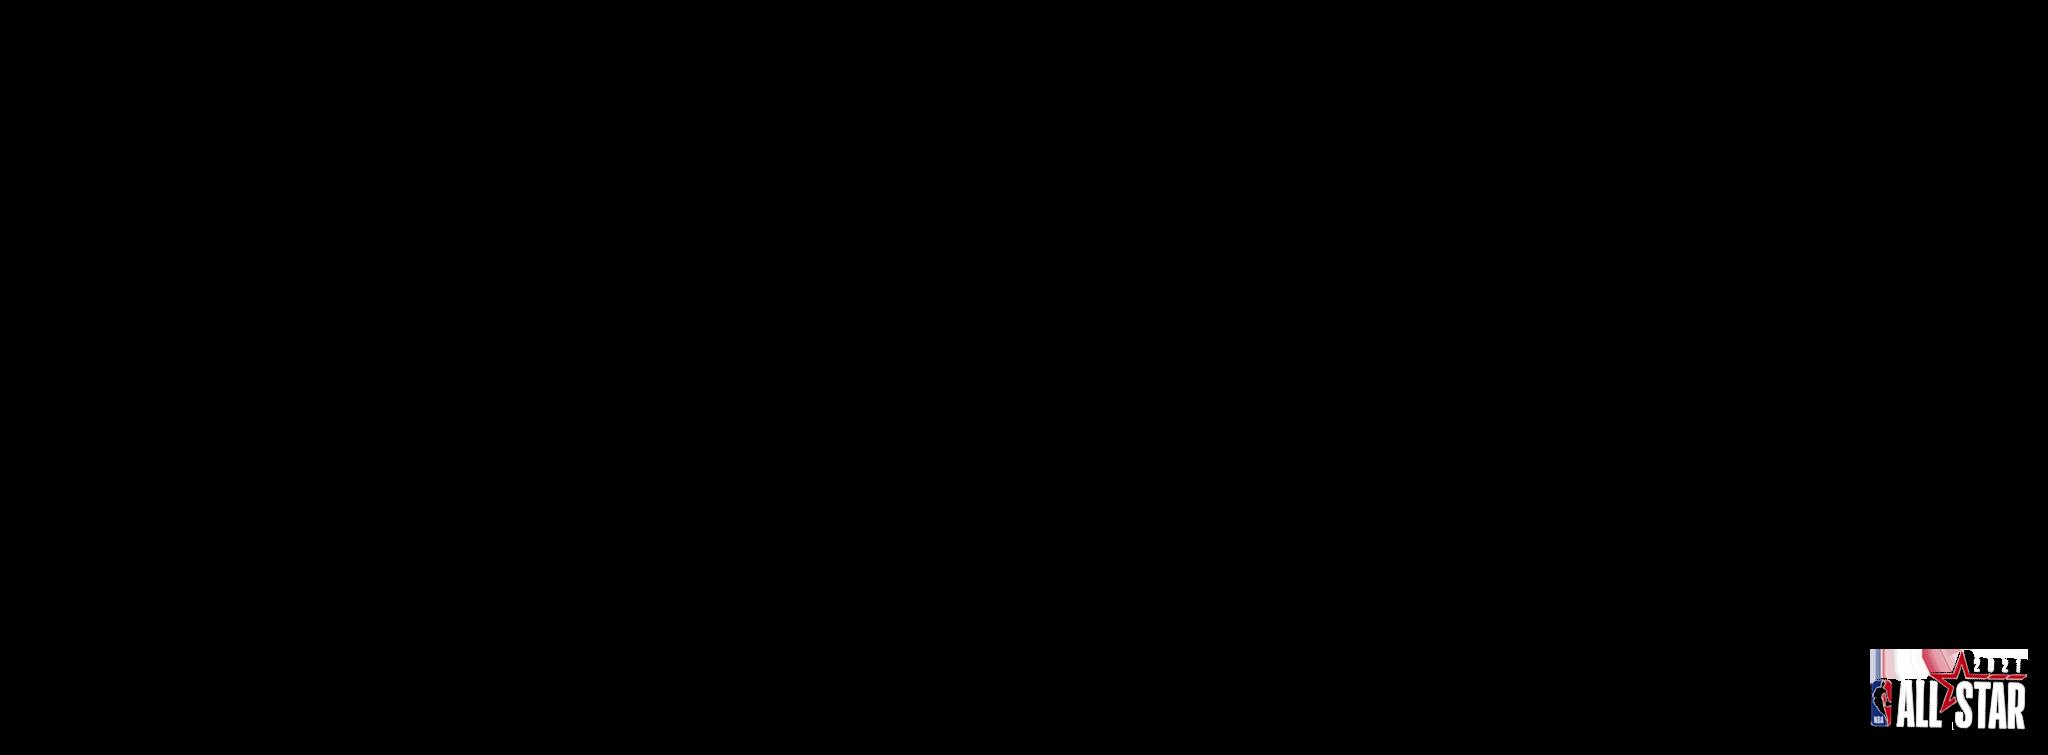 KYRIE-ALL-STAR